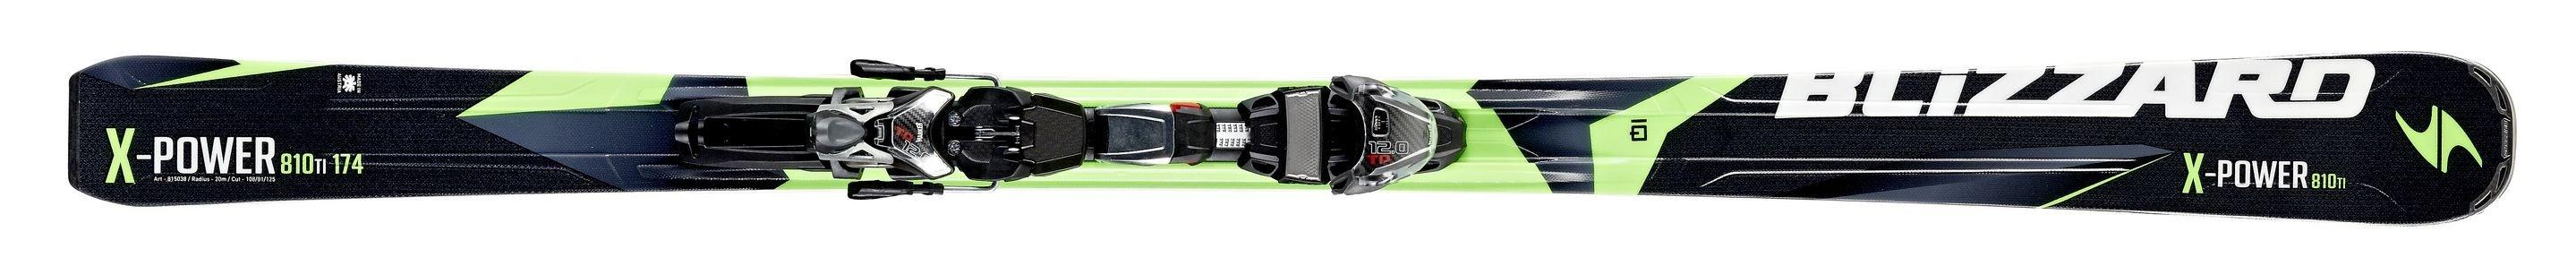 X-POWER 810 Ti IQ